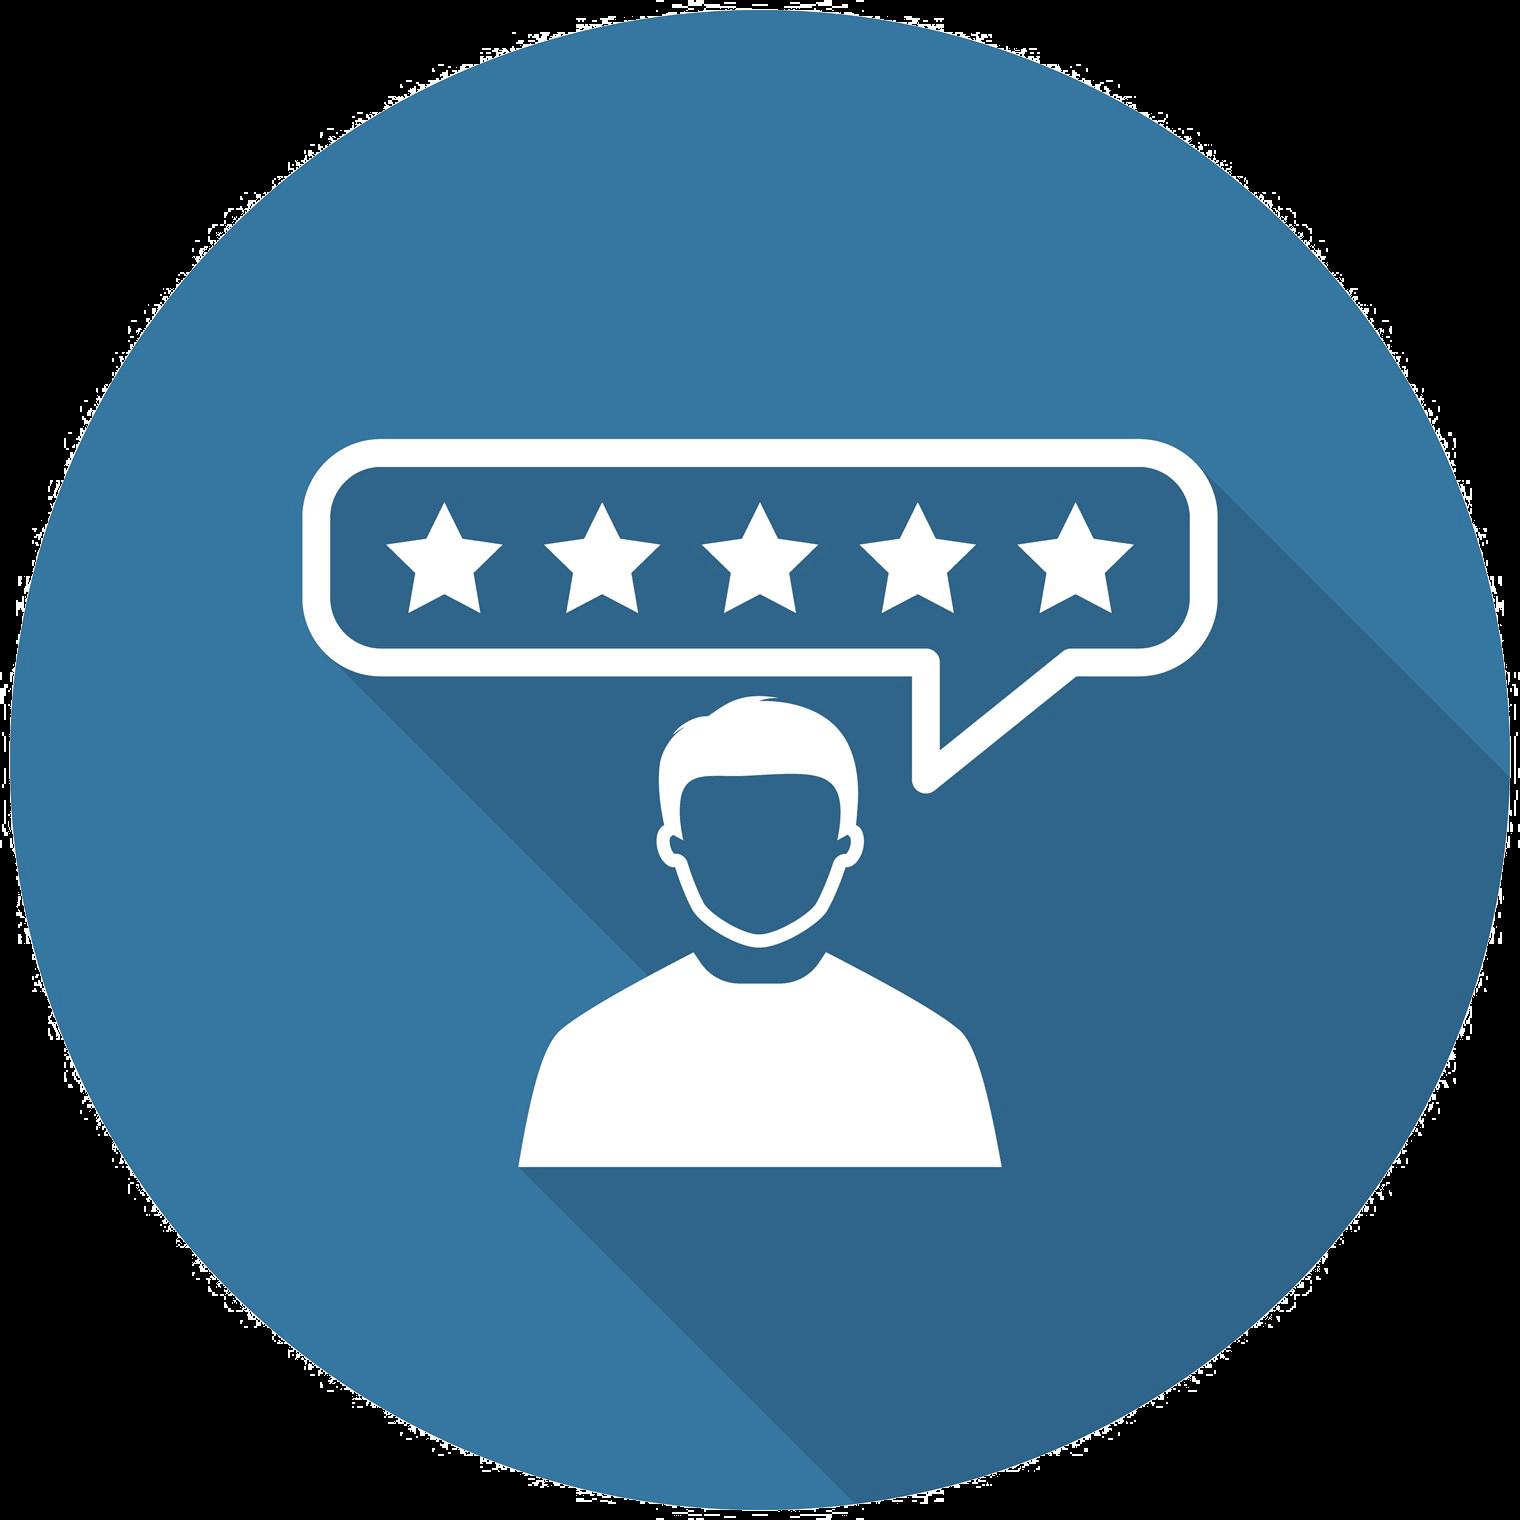 five-star-public-affairs-uk icon